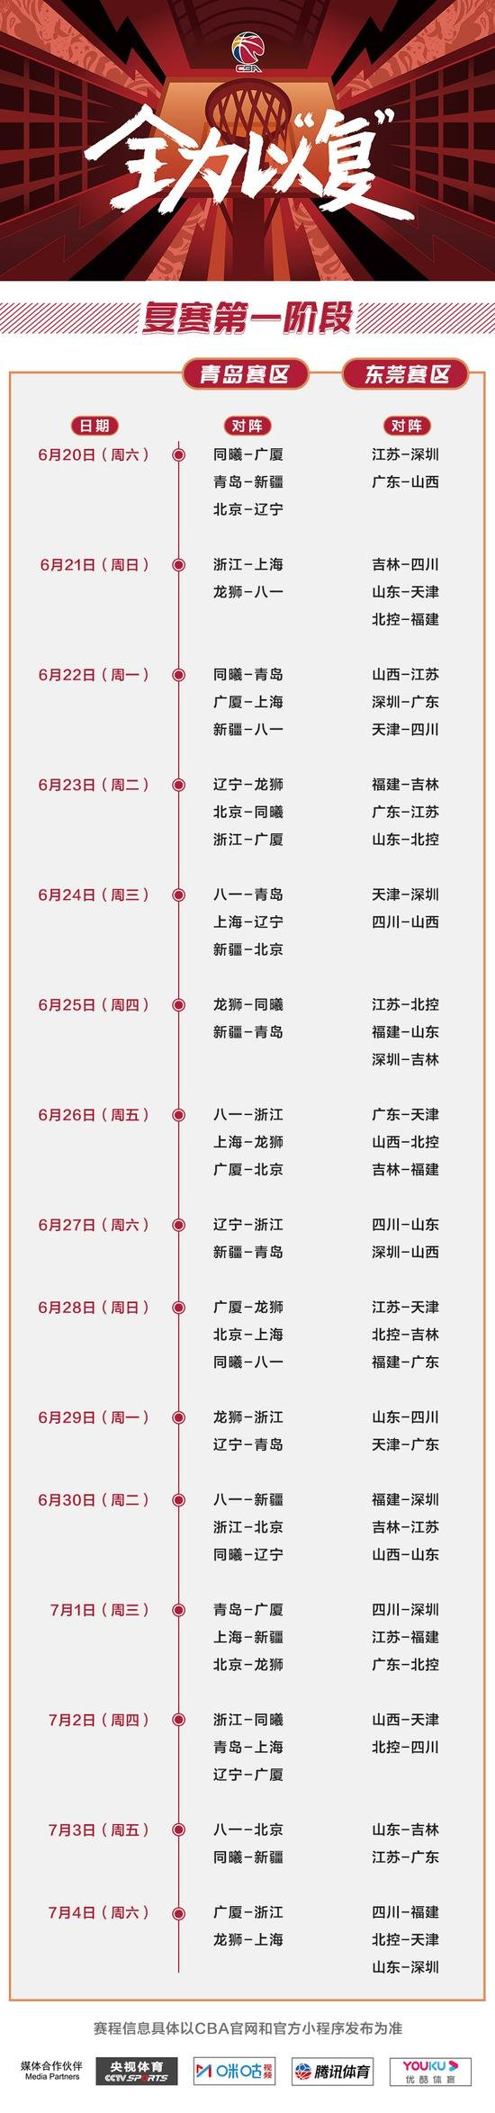 CBA复赛东莞赛区有什么球队?